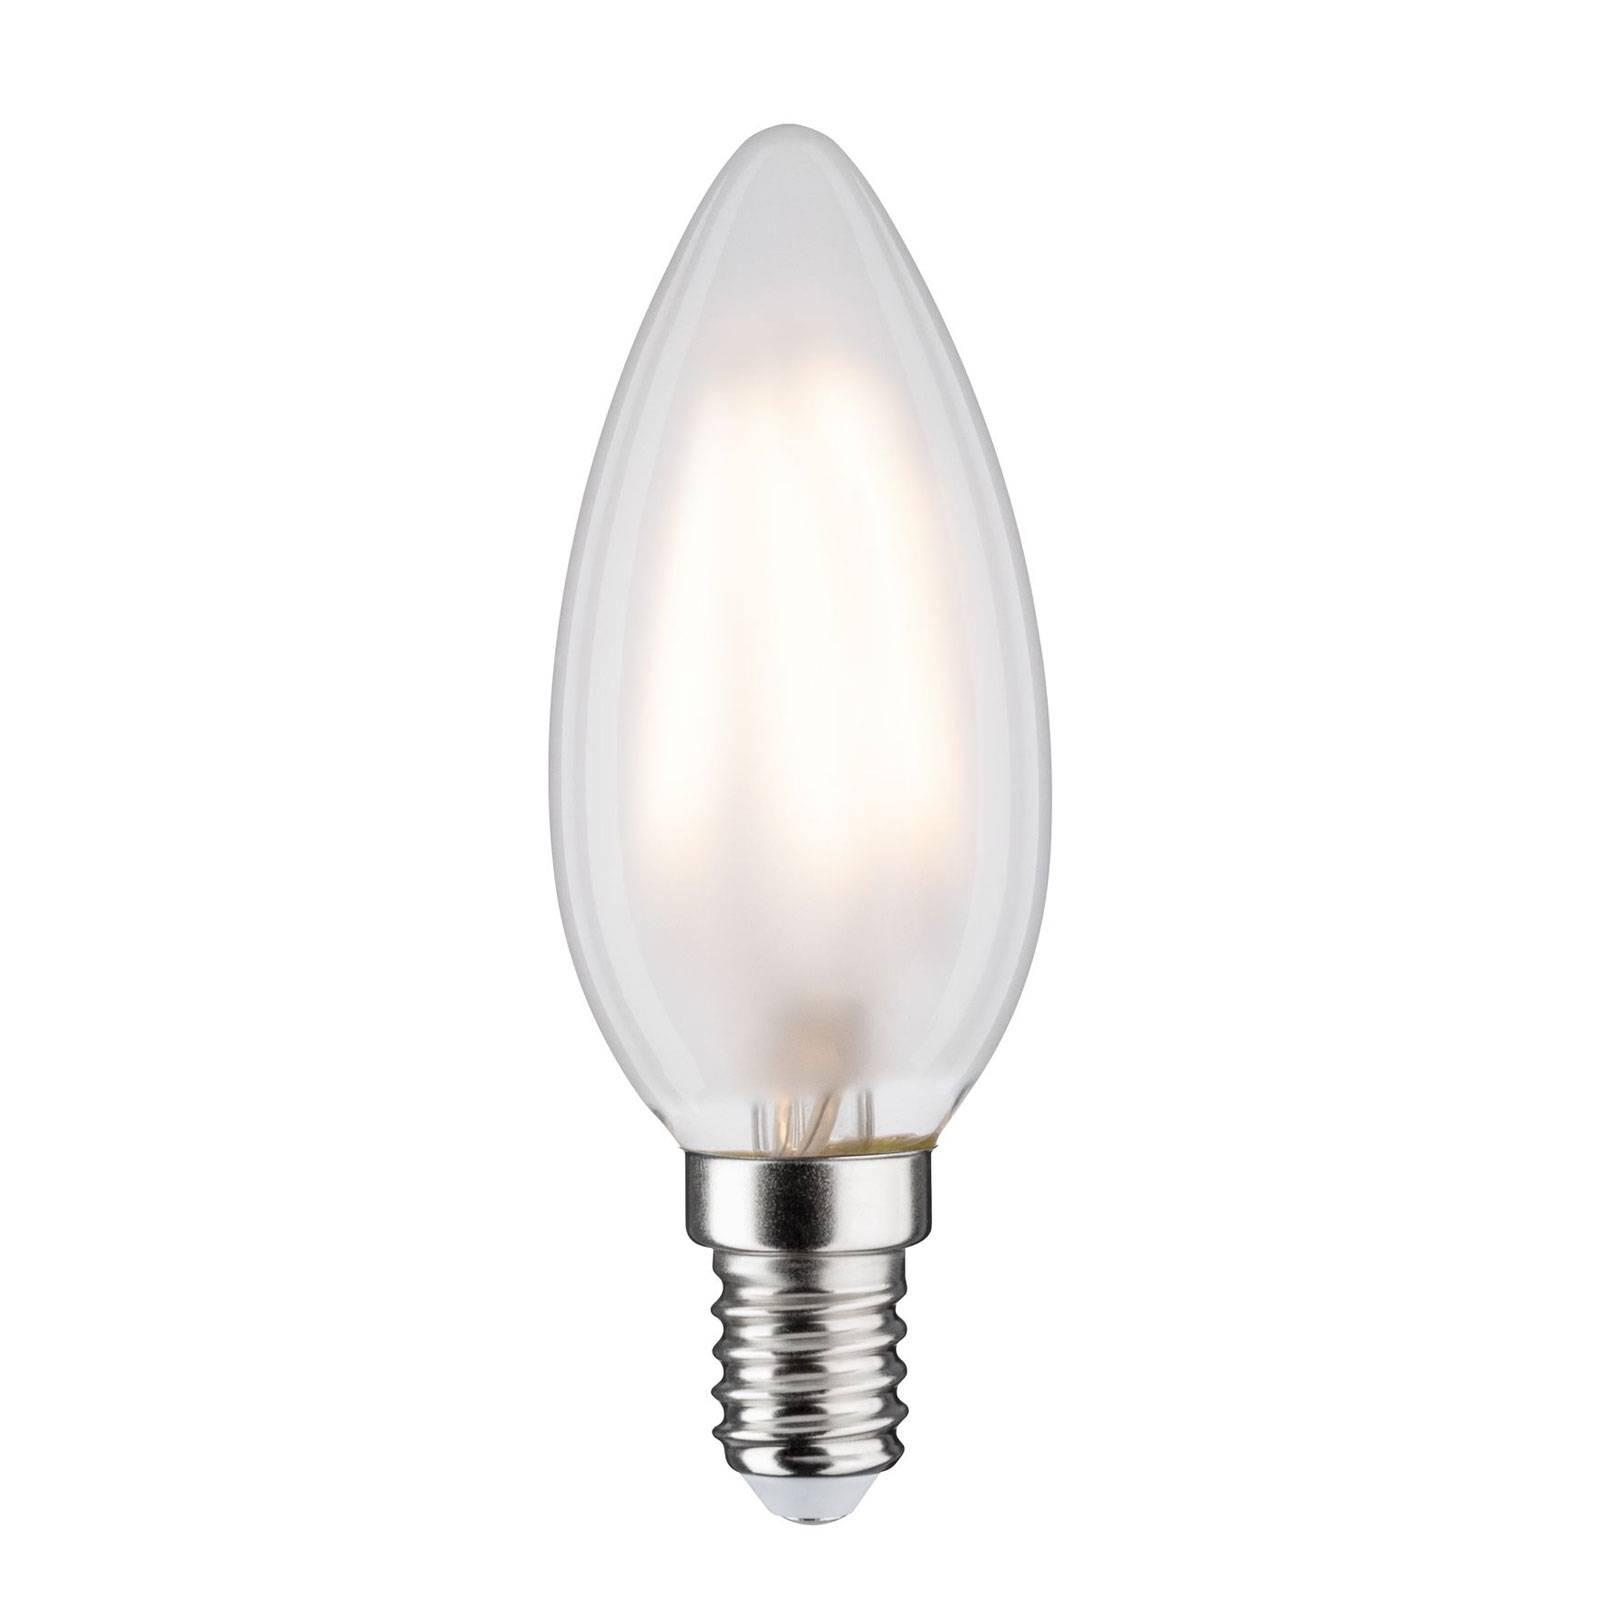 LED-kynttilälamppu E14 4,5W 2 700 K matta